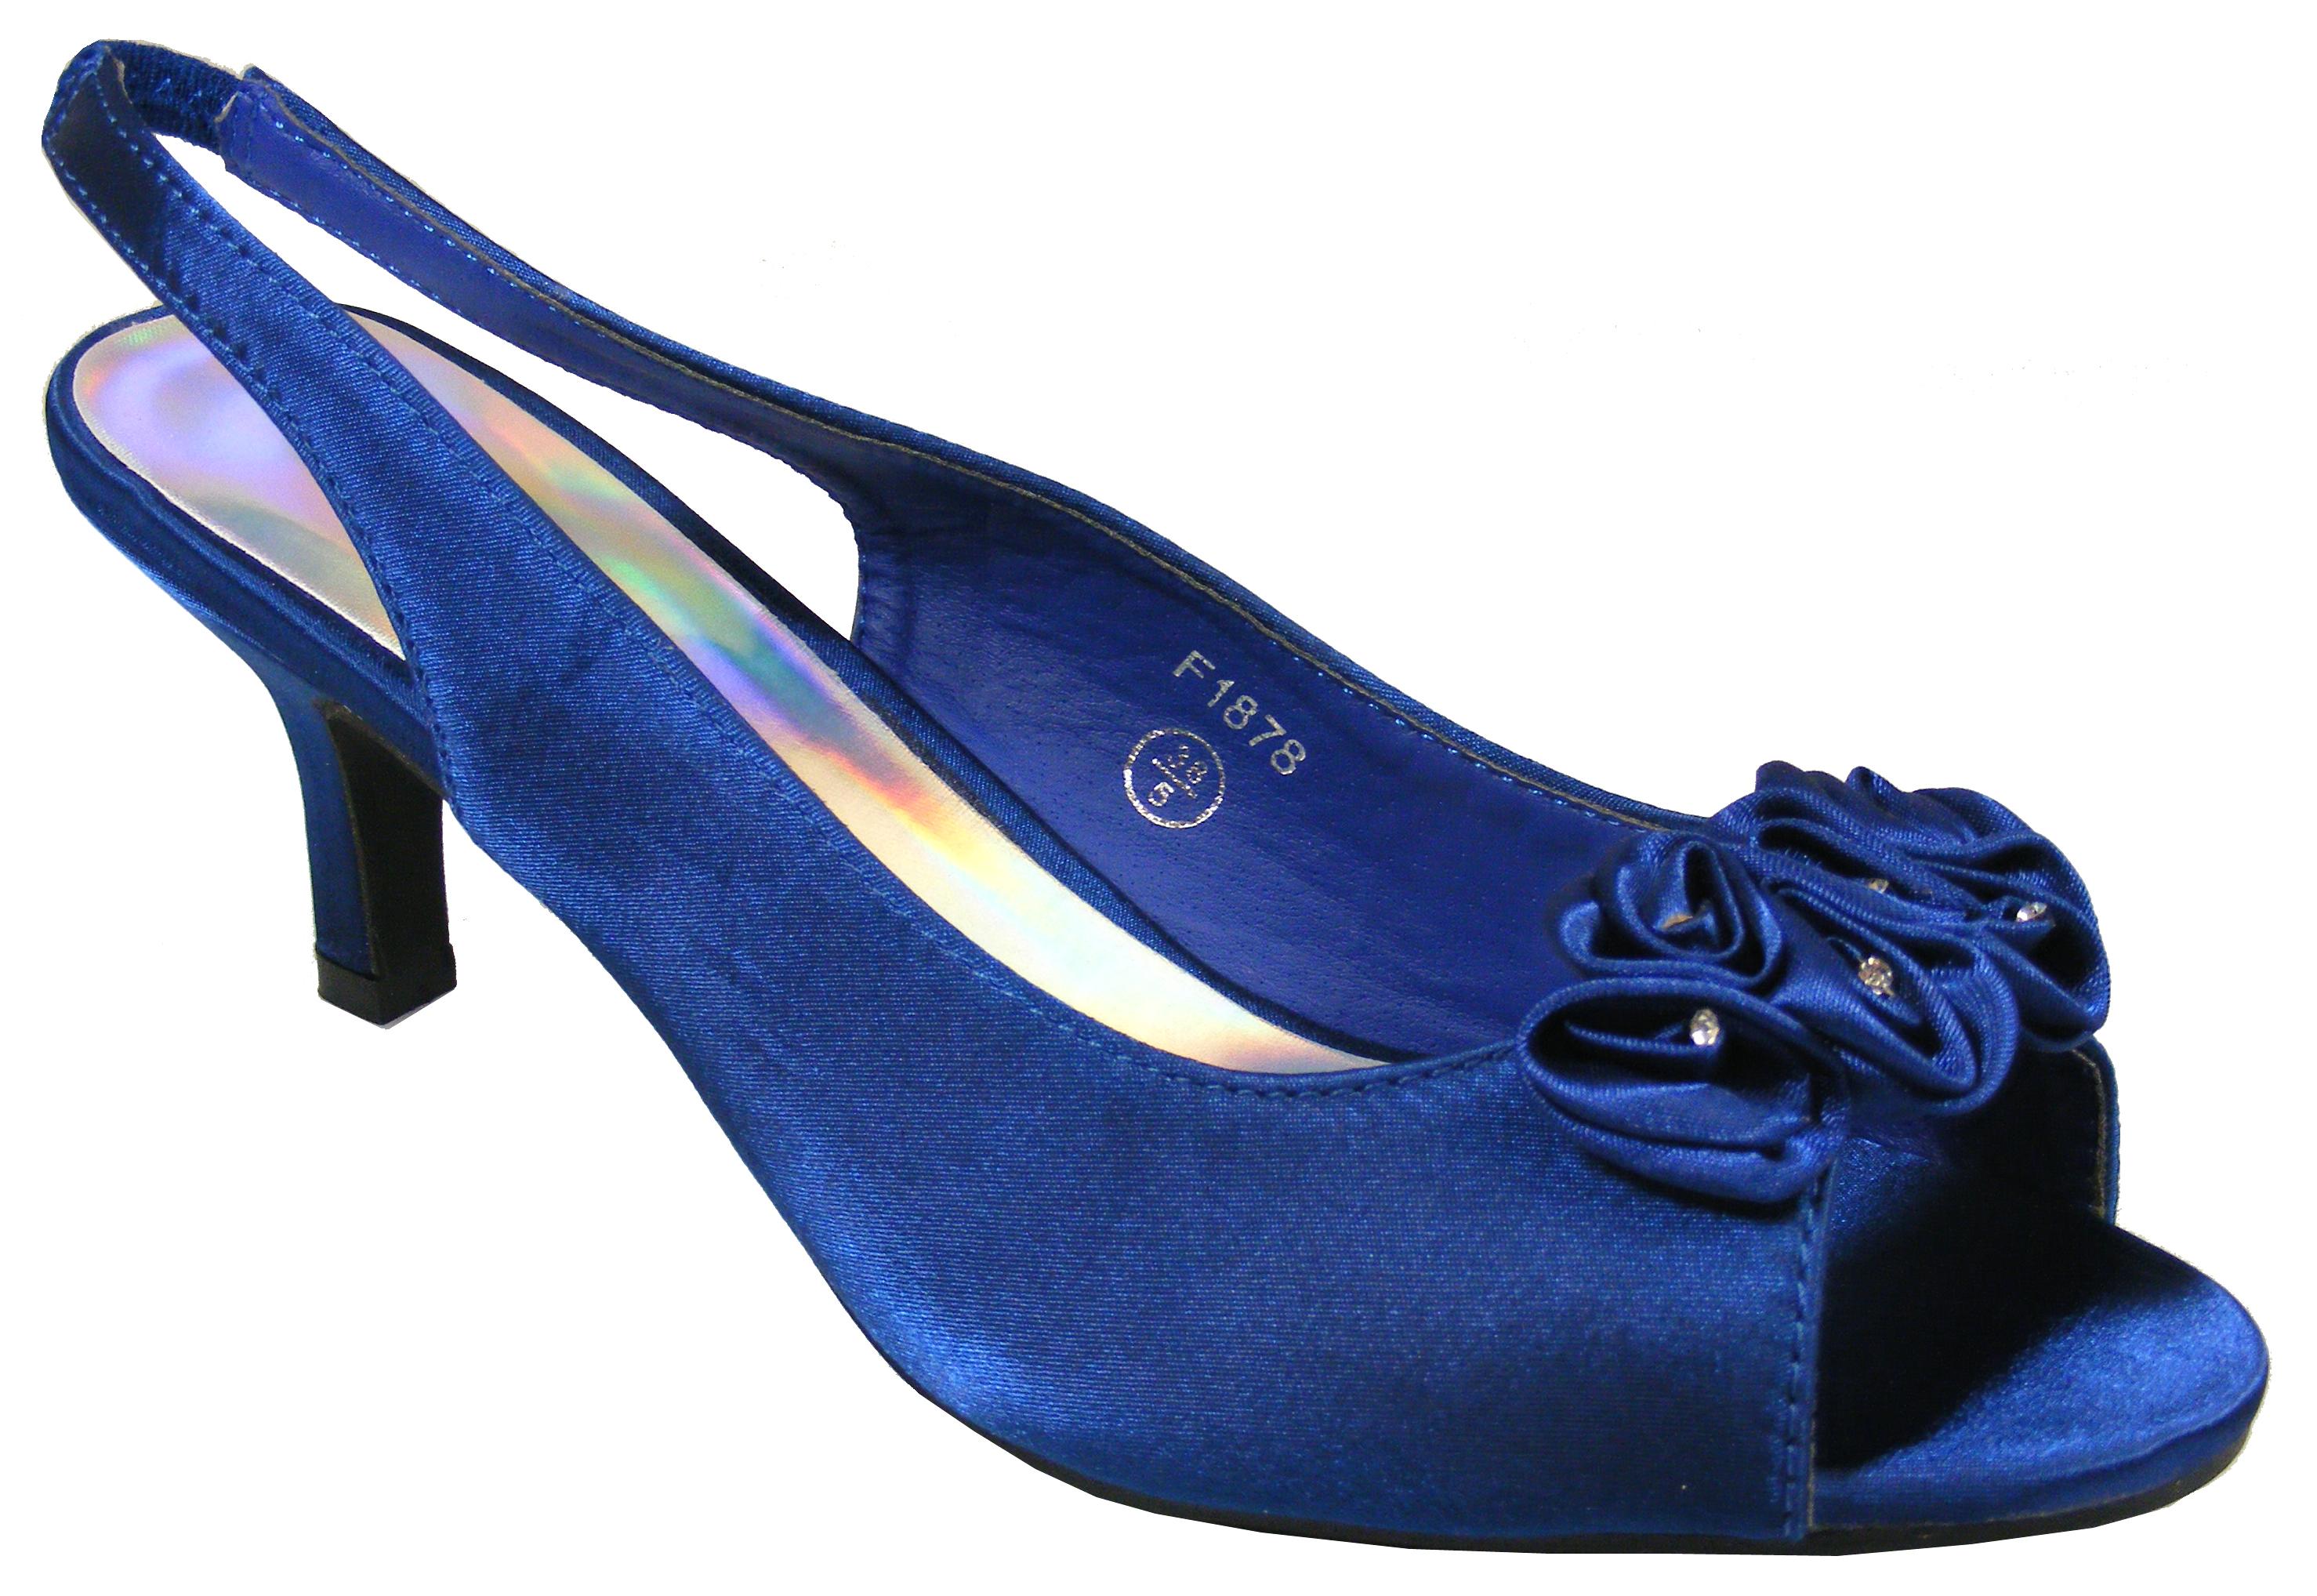 Womens Navy Blue Satin Low Heels Slingback Wedding Bridal Shoes